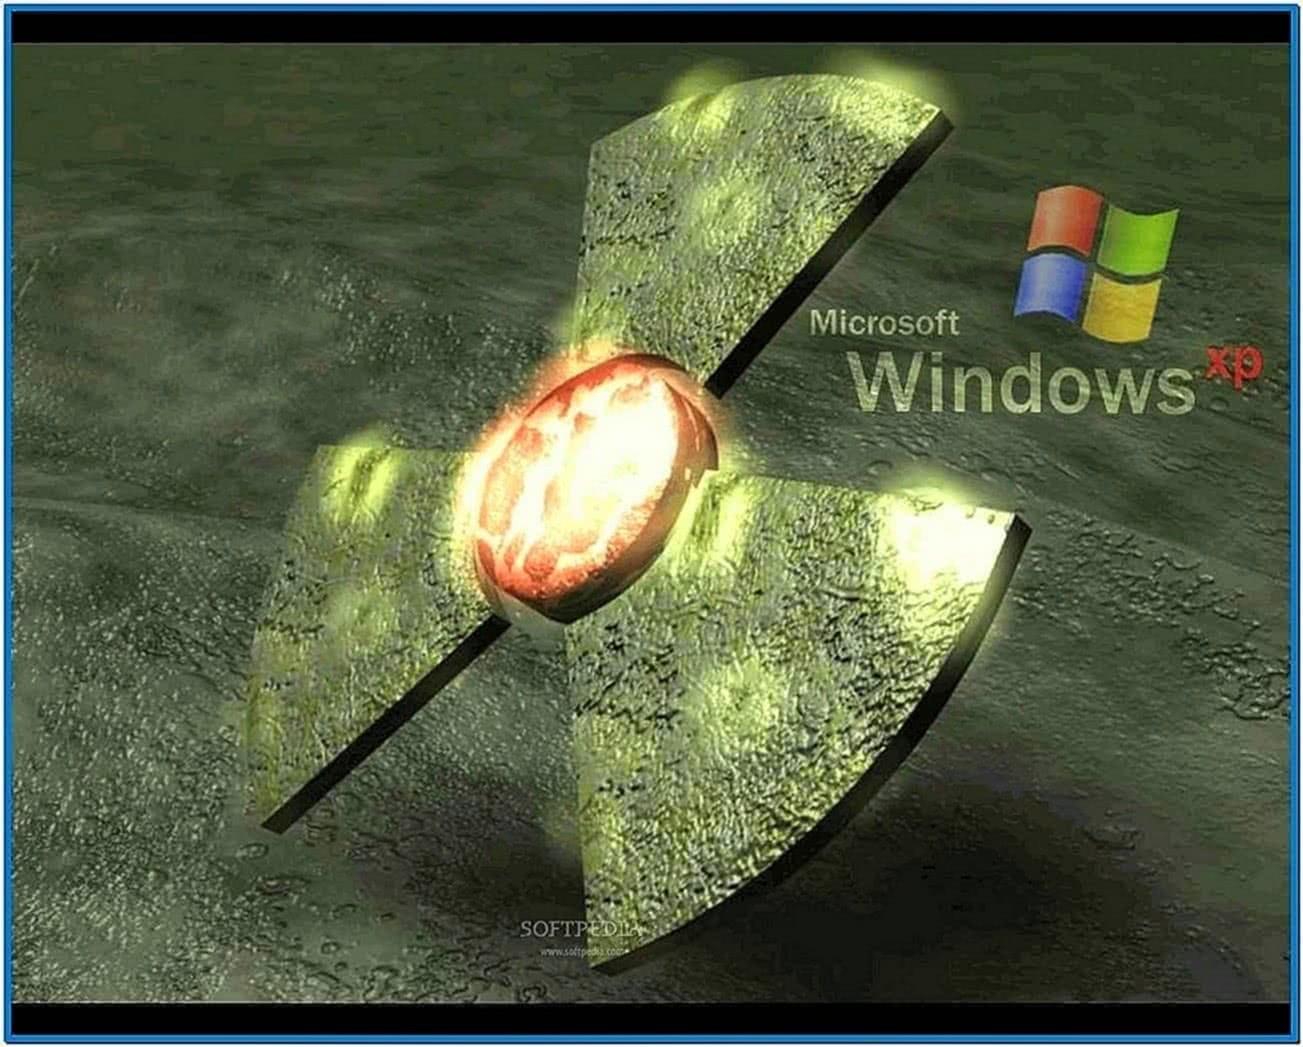 Windows XP Themes Screensaver